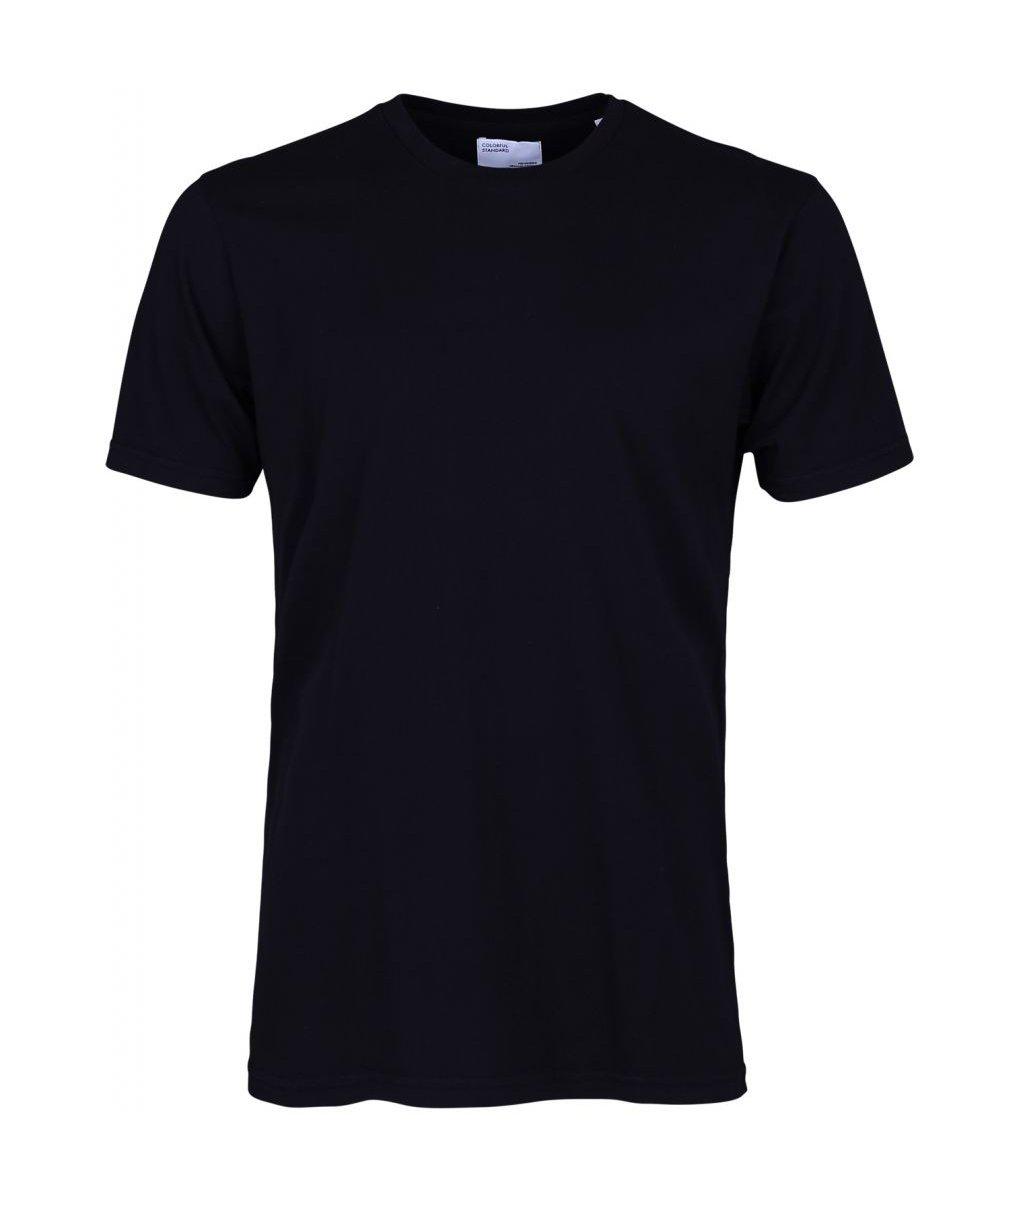 Colorful Standard COLORFUL STANDARD classic organic cotton tee shirt round neck deep black (unisex)